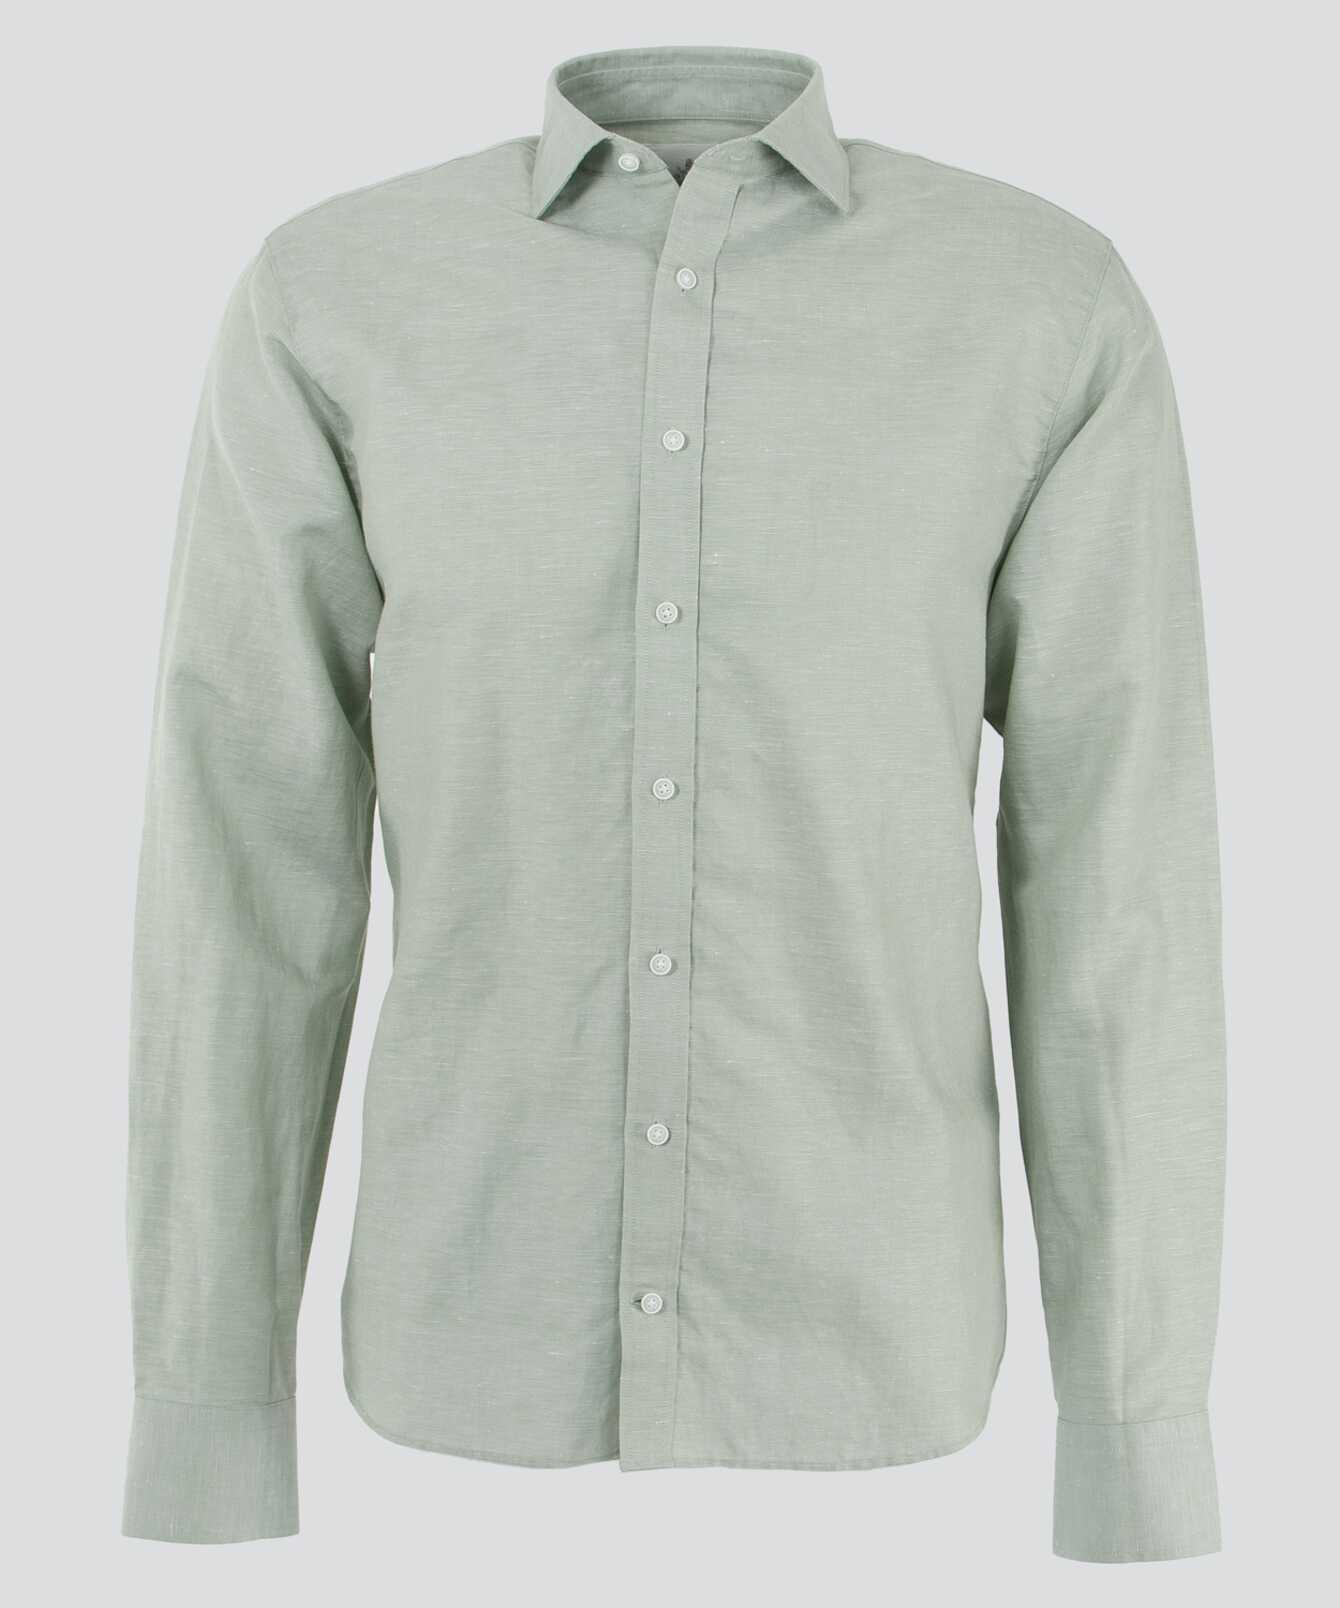 Shirt Portofino Linen Pistage The Shirt Factory